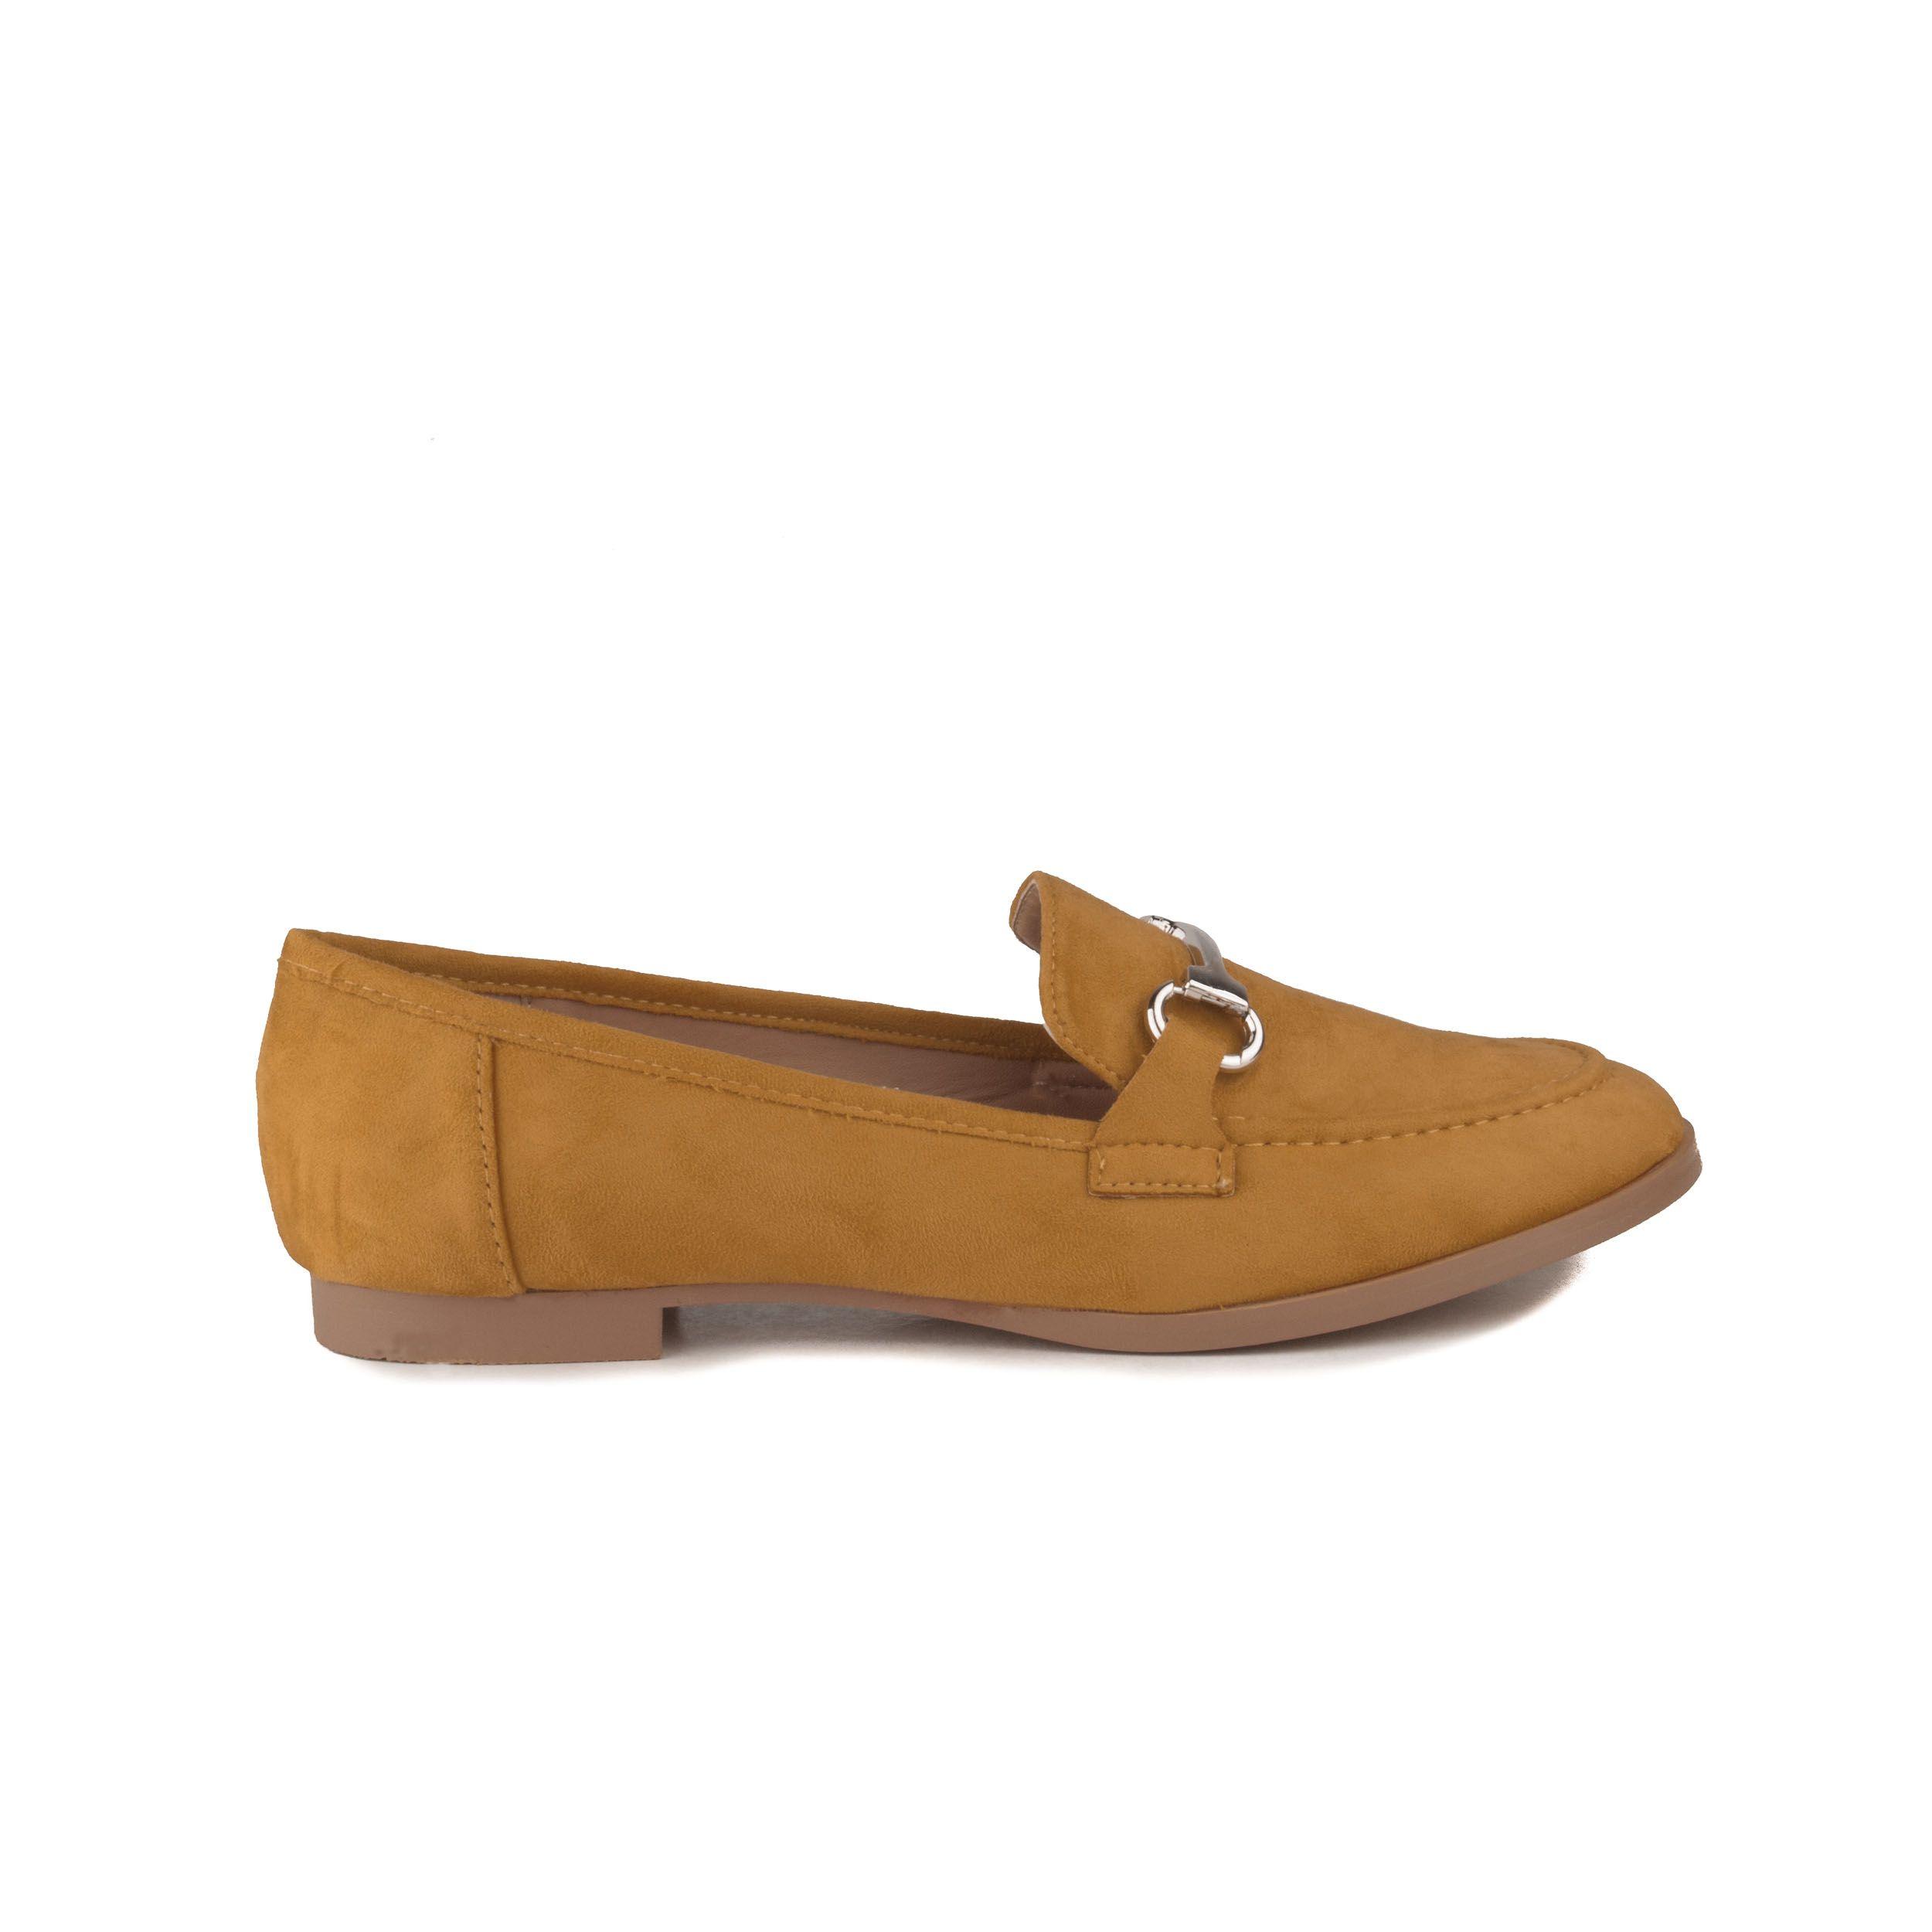 Montevita Comfortable Loafer in Mustard